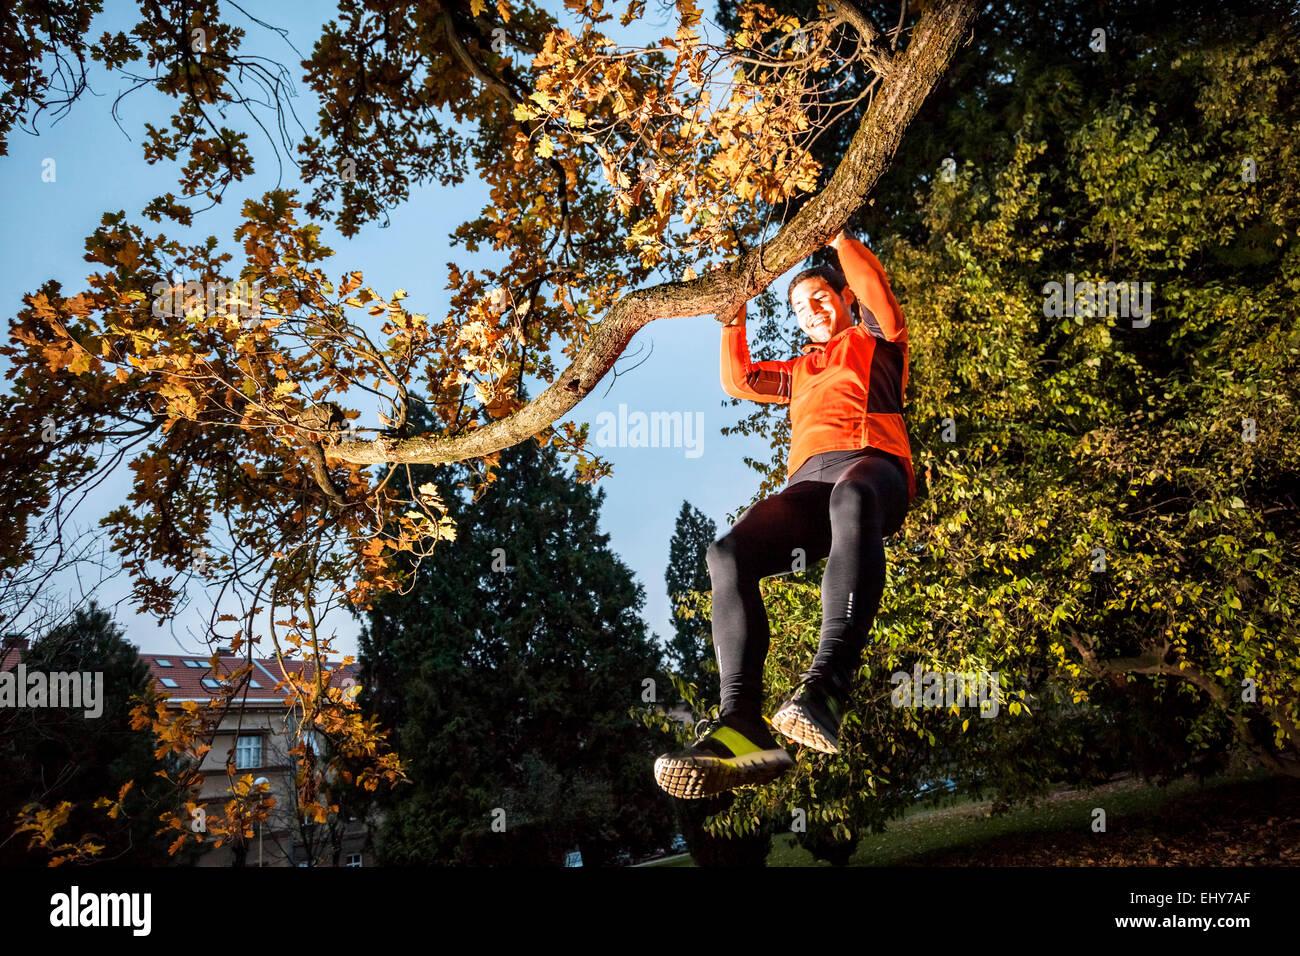 Male runner doing chin-ups in tree - Stock Image